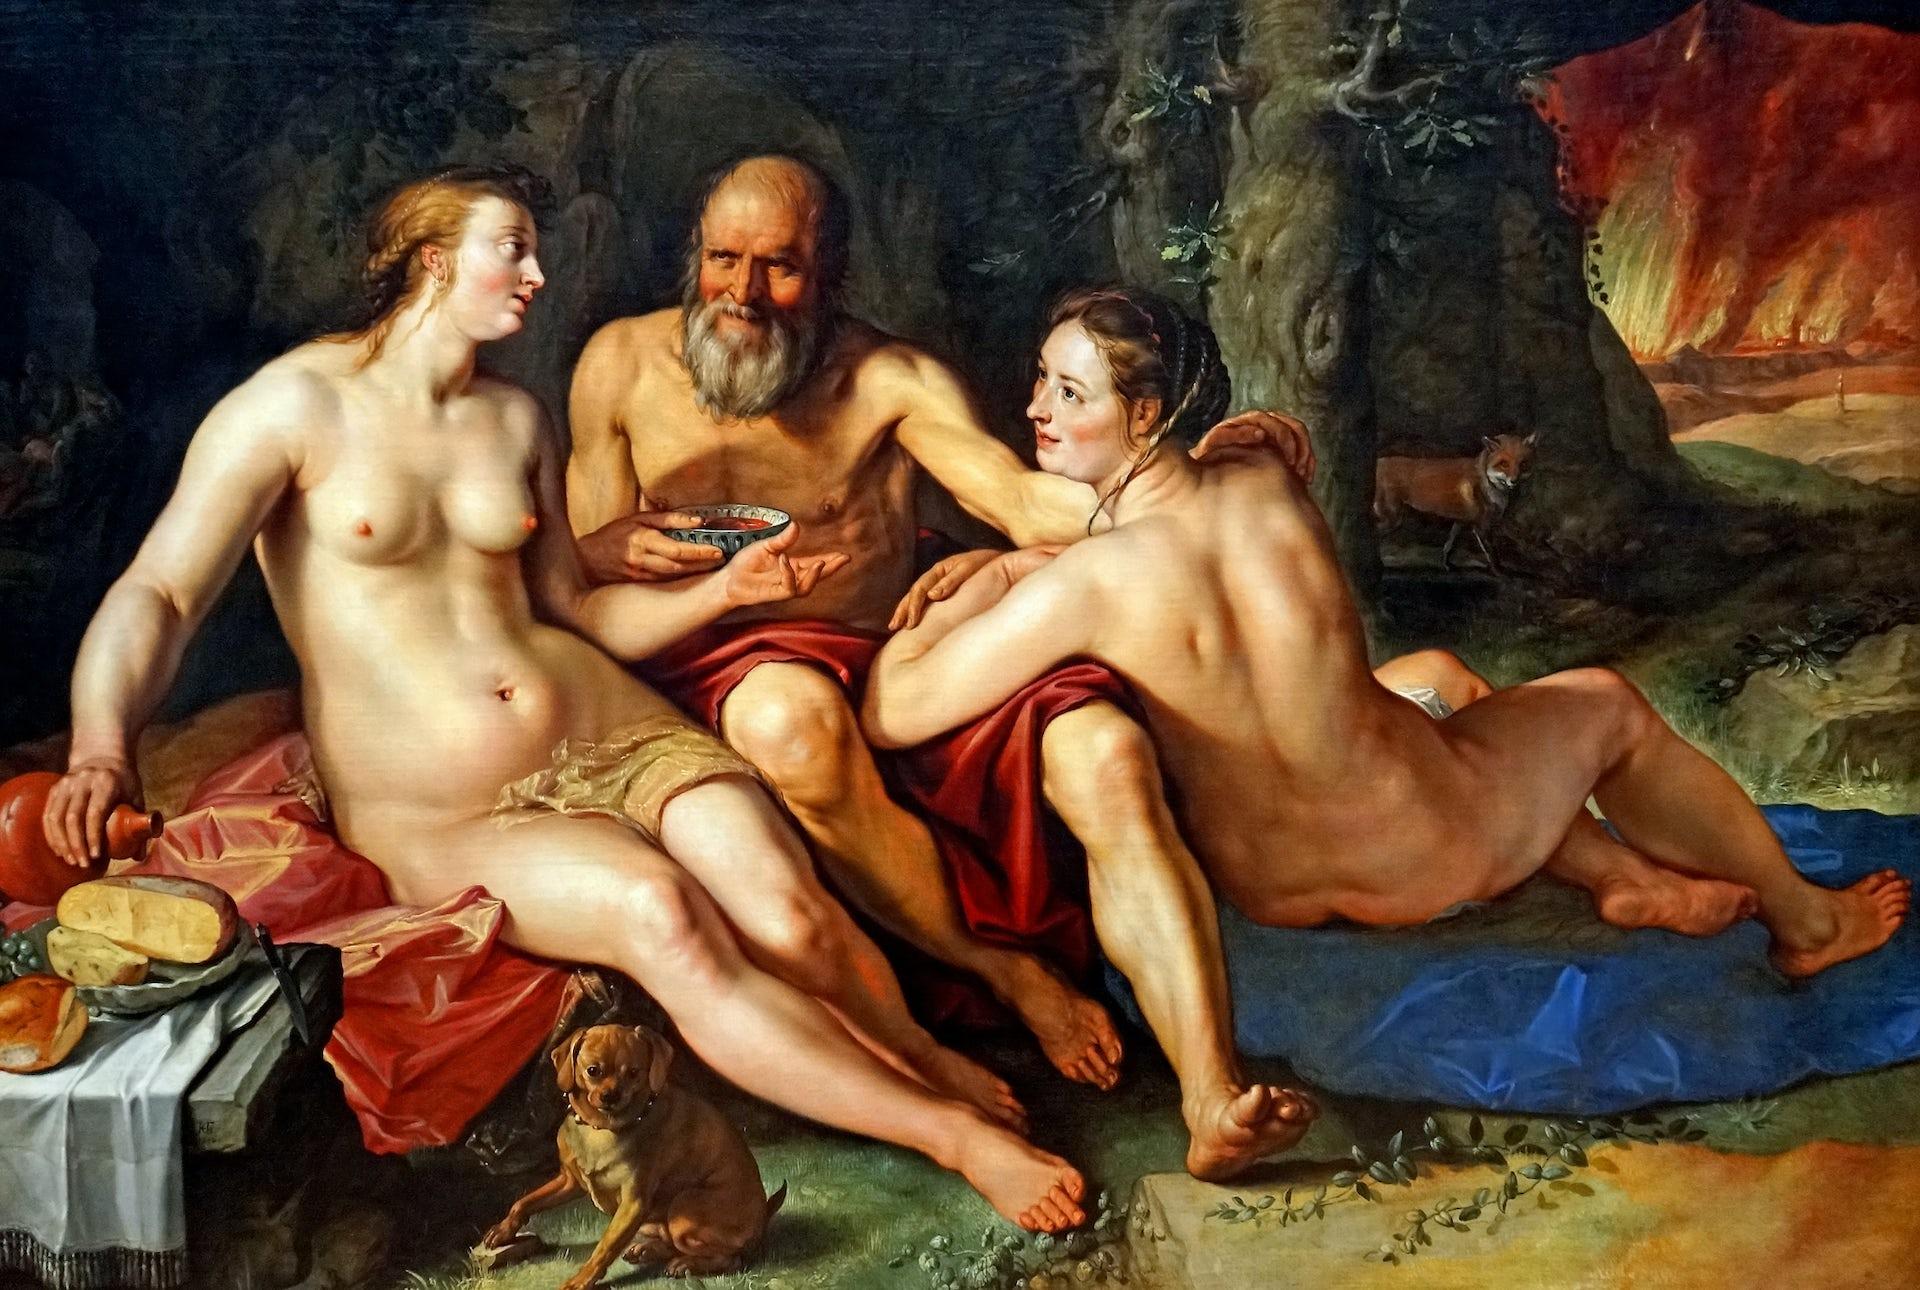 Hot naked women latina